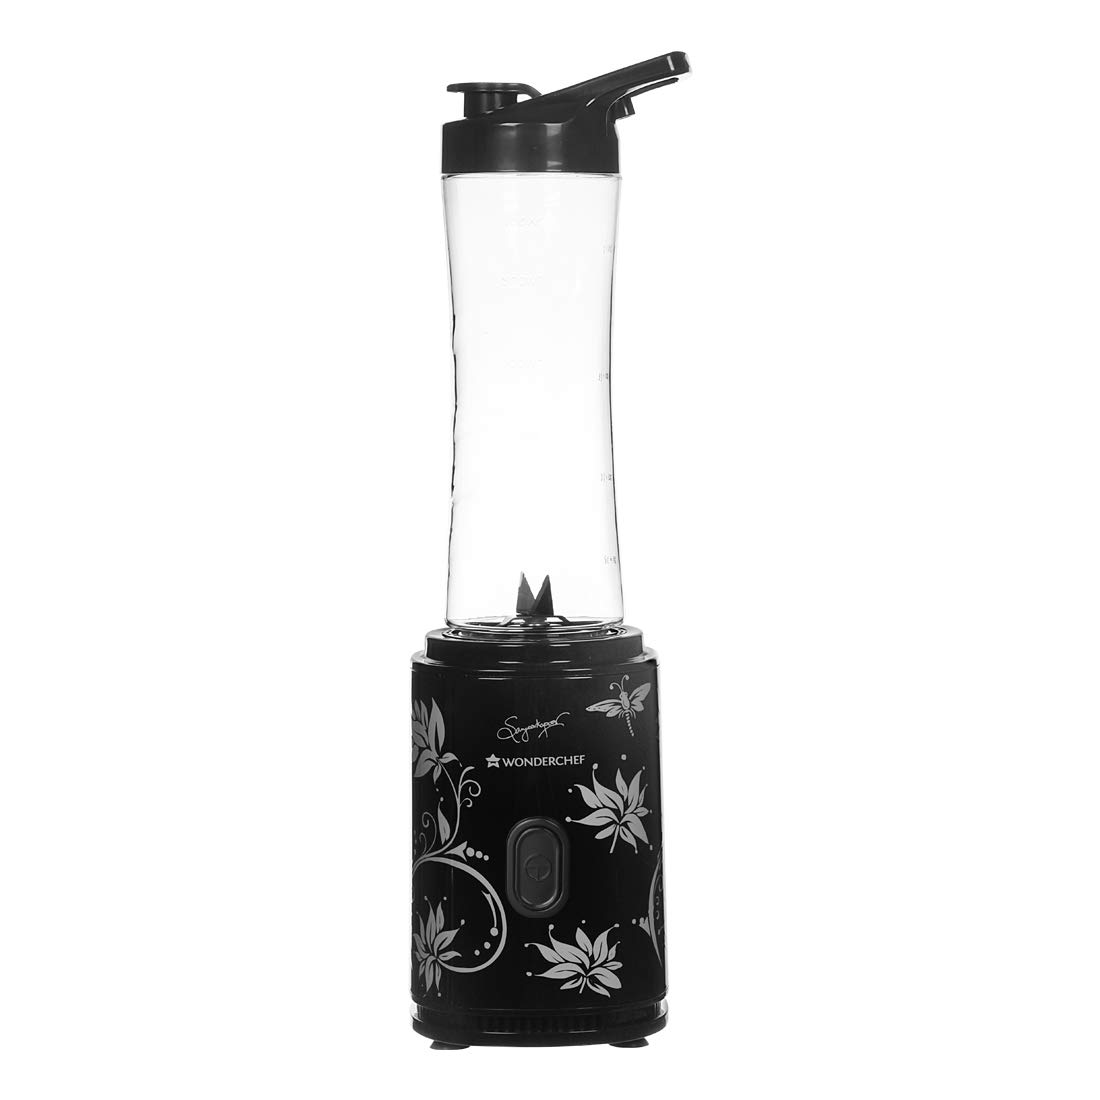 Top 8 Most Popular Portable Juicer Blender In India 2021